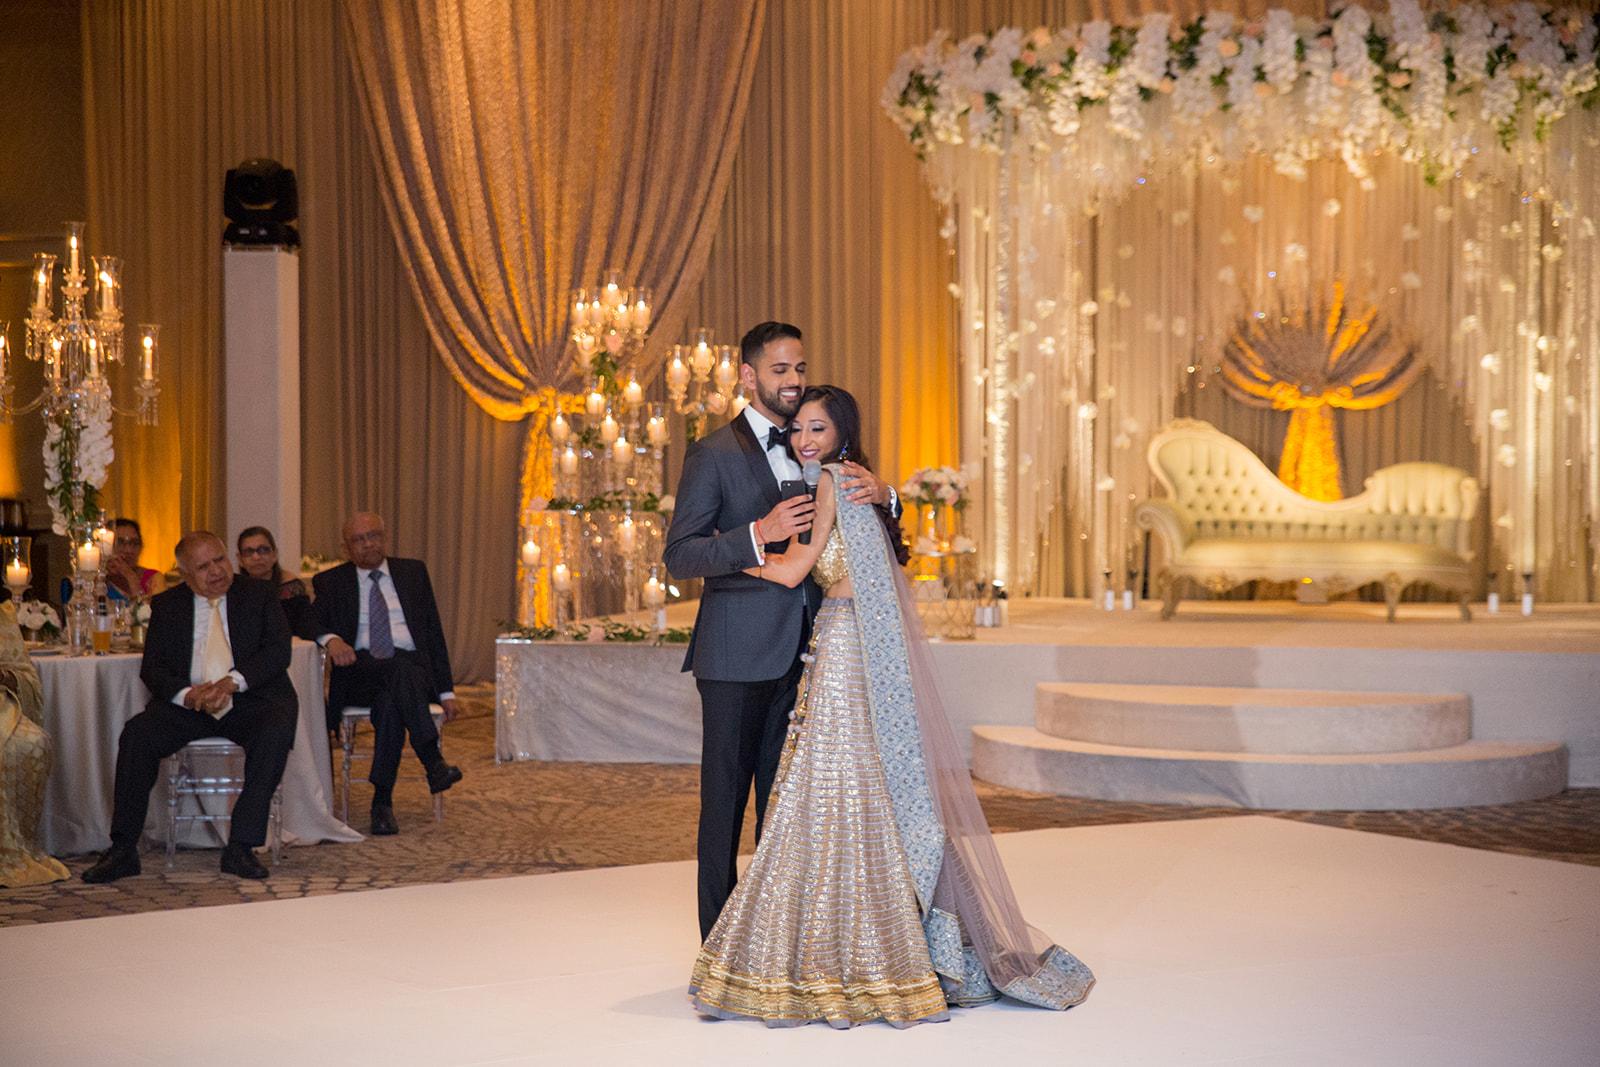 Le Cape Weddings - Puja and Kheelan - Reception -85.jpg